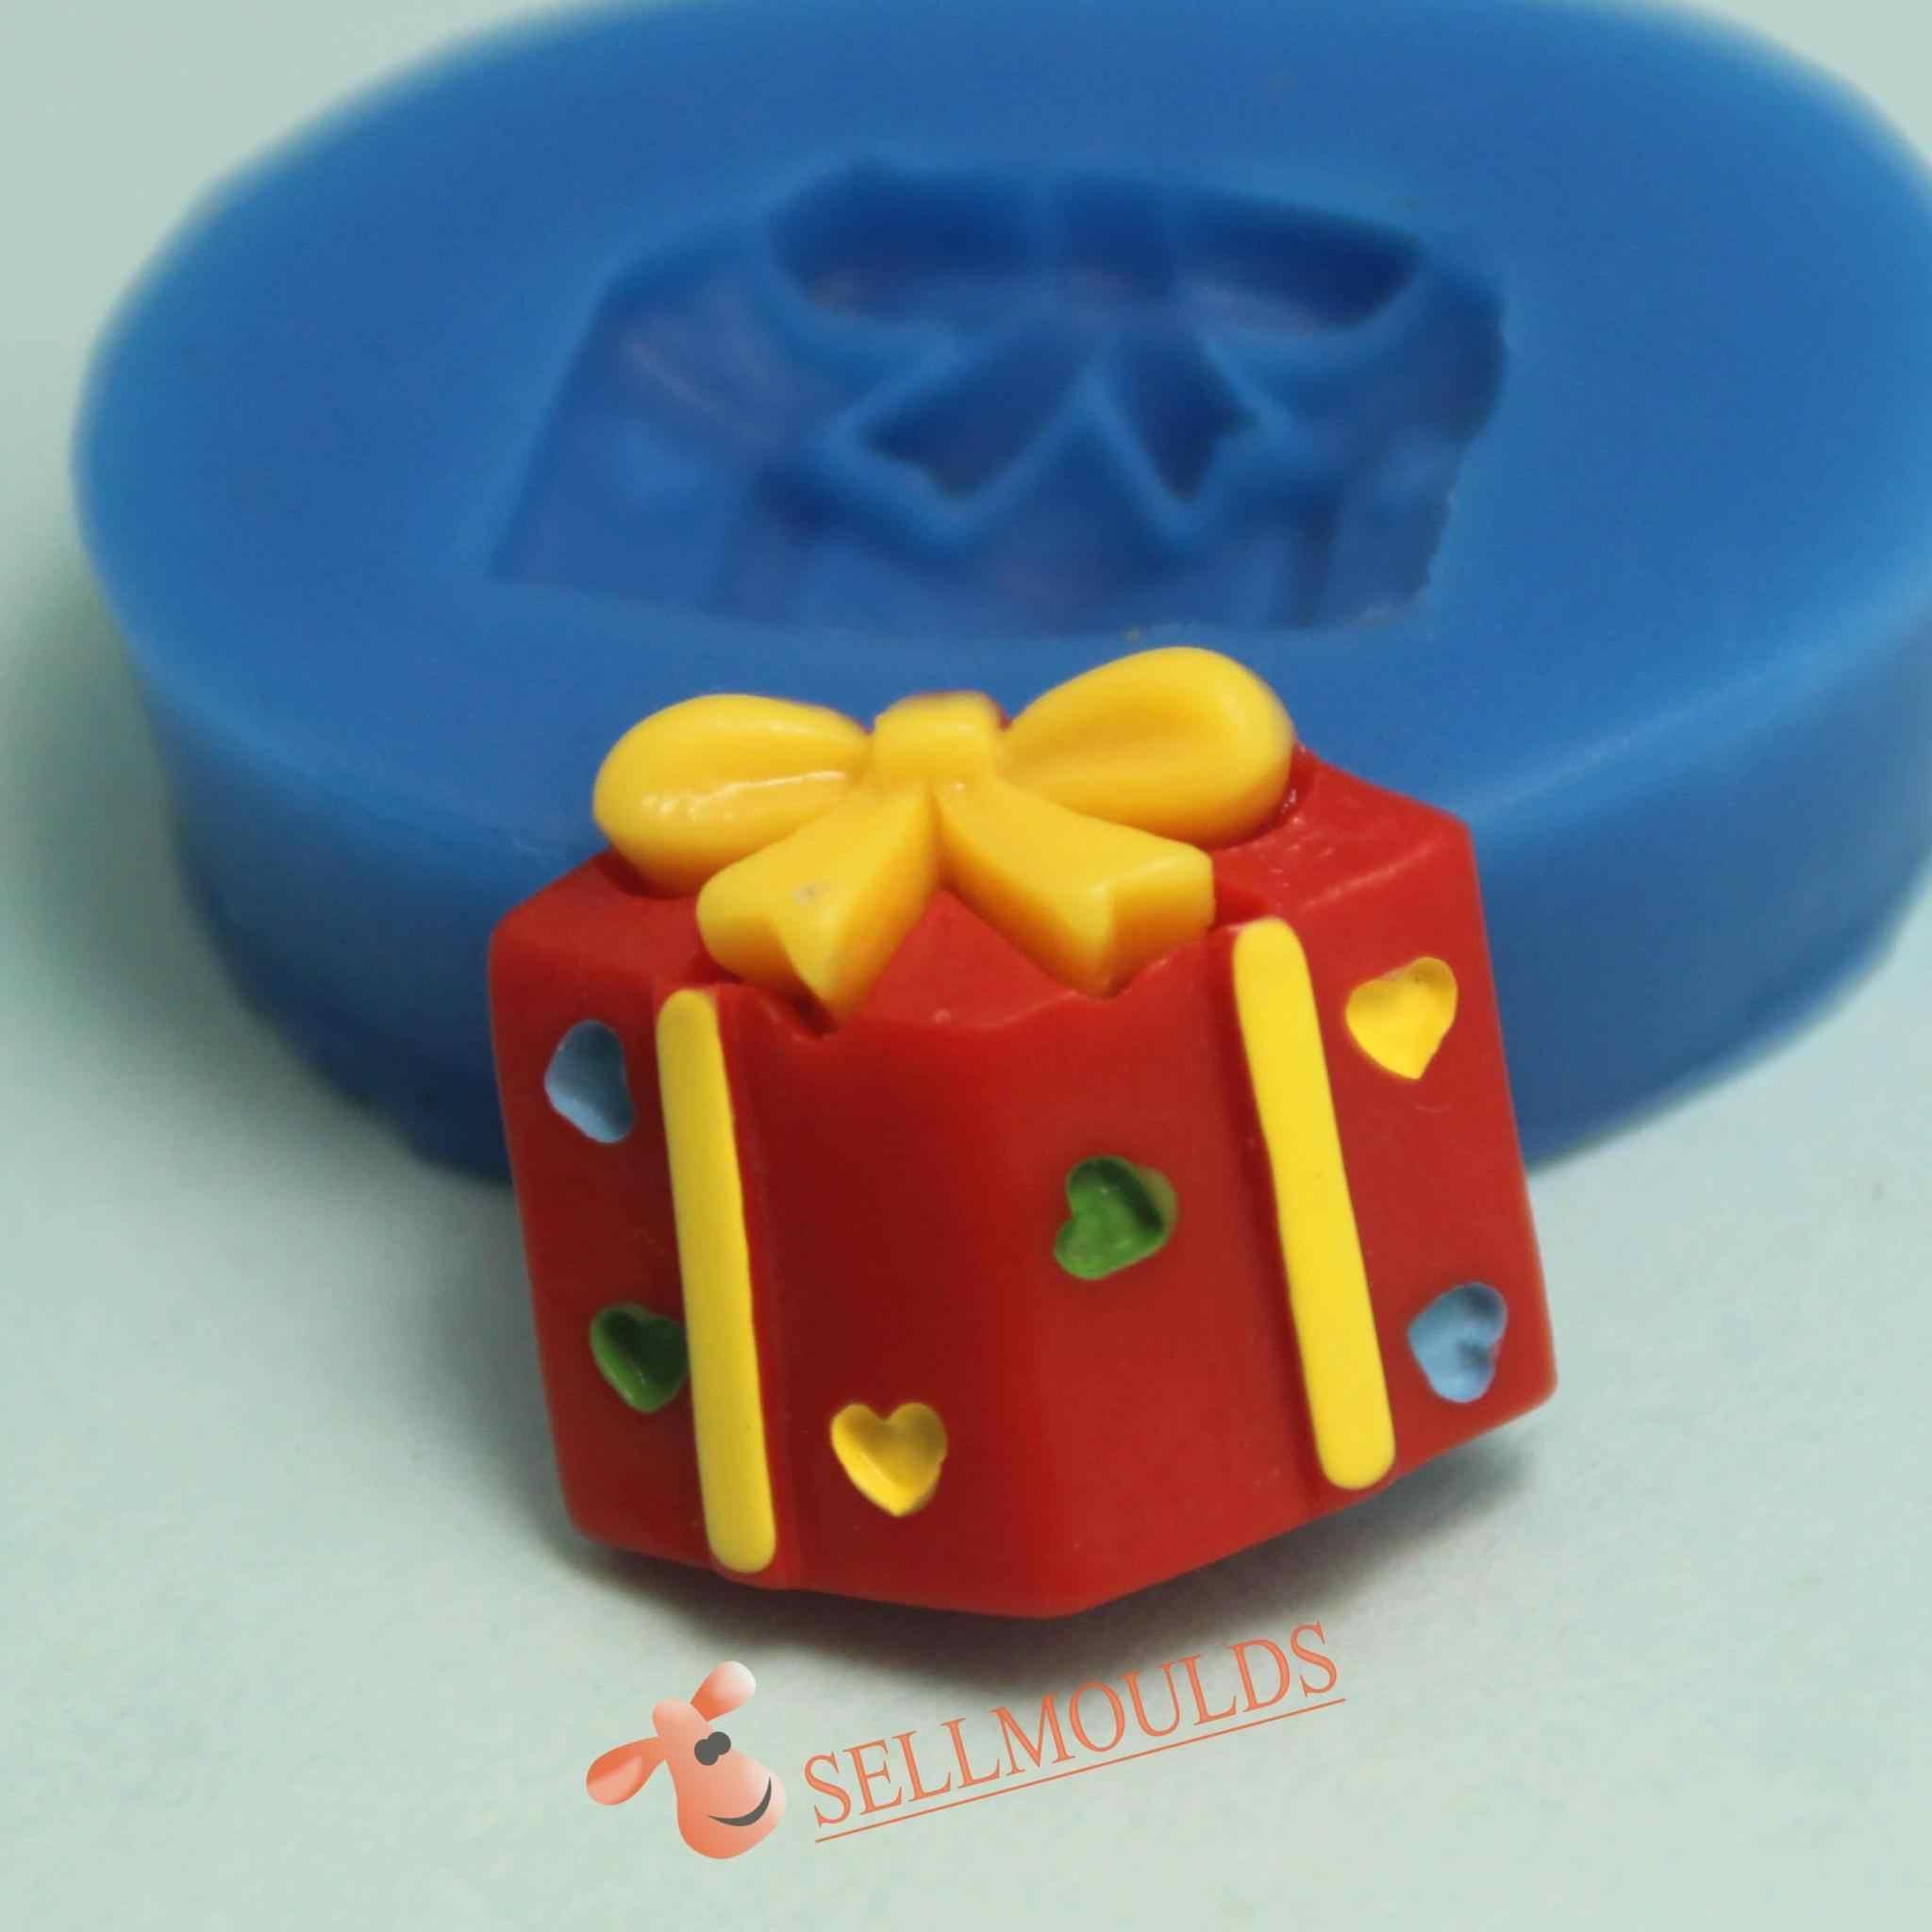 F1019 جديد هدية الكريسماس قالب من السيليكون فندان قوالب سيليكون قالب الكعكة bksilicon صغيرة